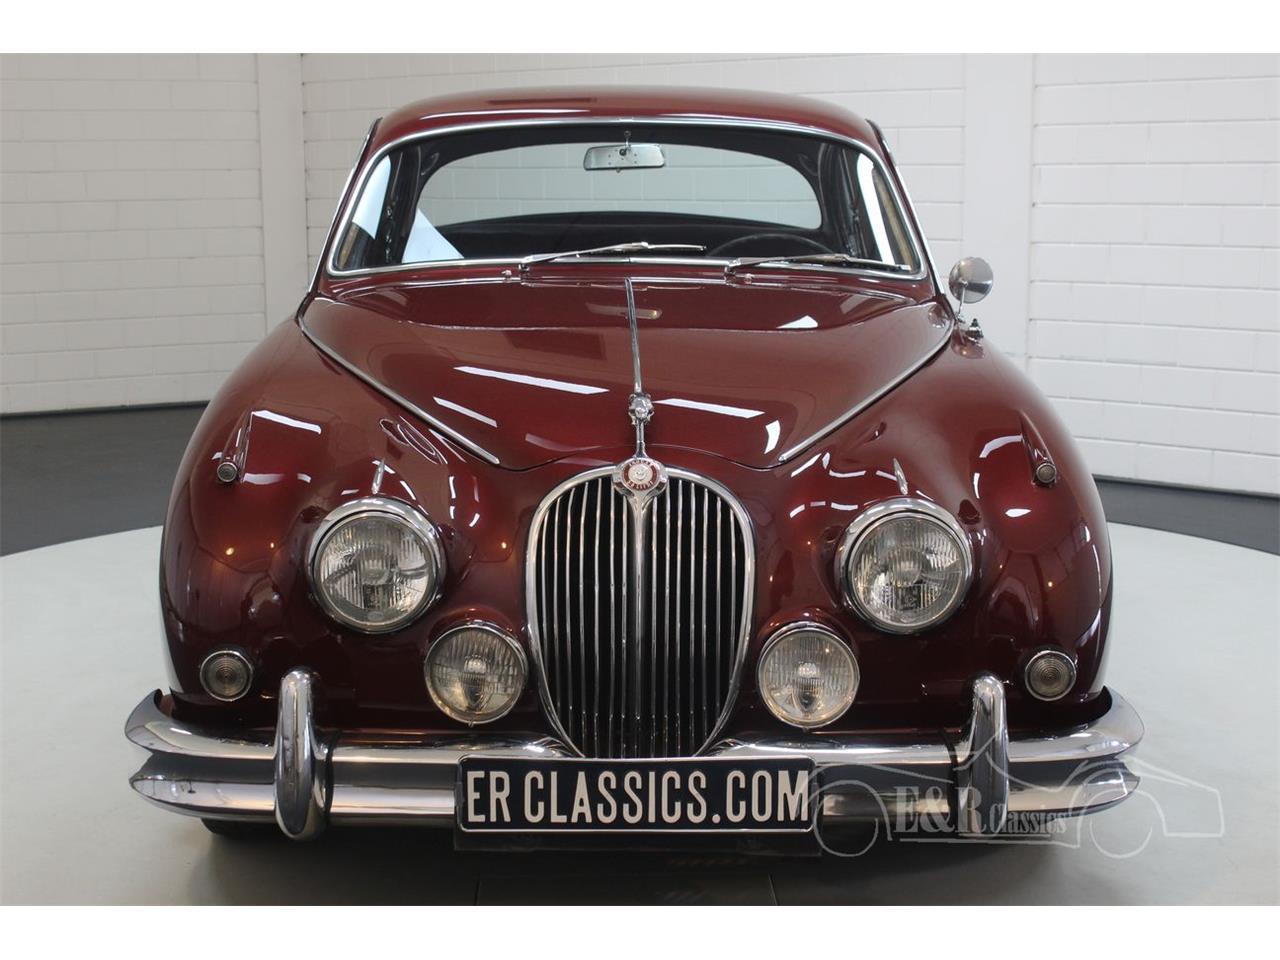 Large Picture of Classic 1960 Jaguar Mark II located in Noord-Brabant - $48,200.00 - QJZJ